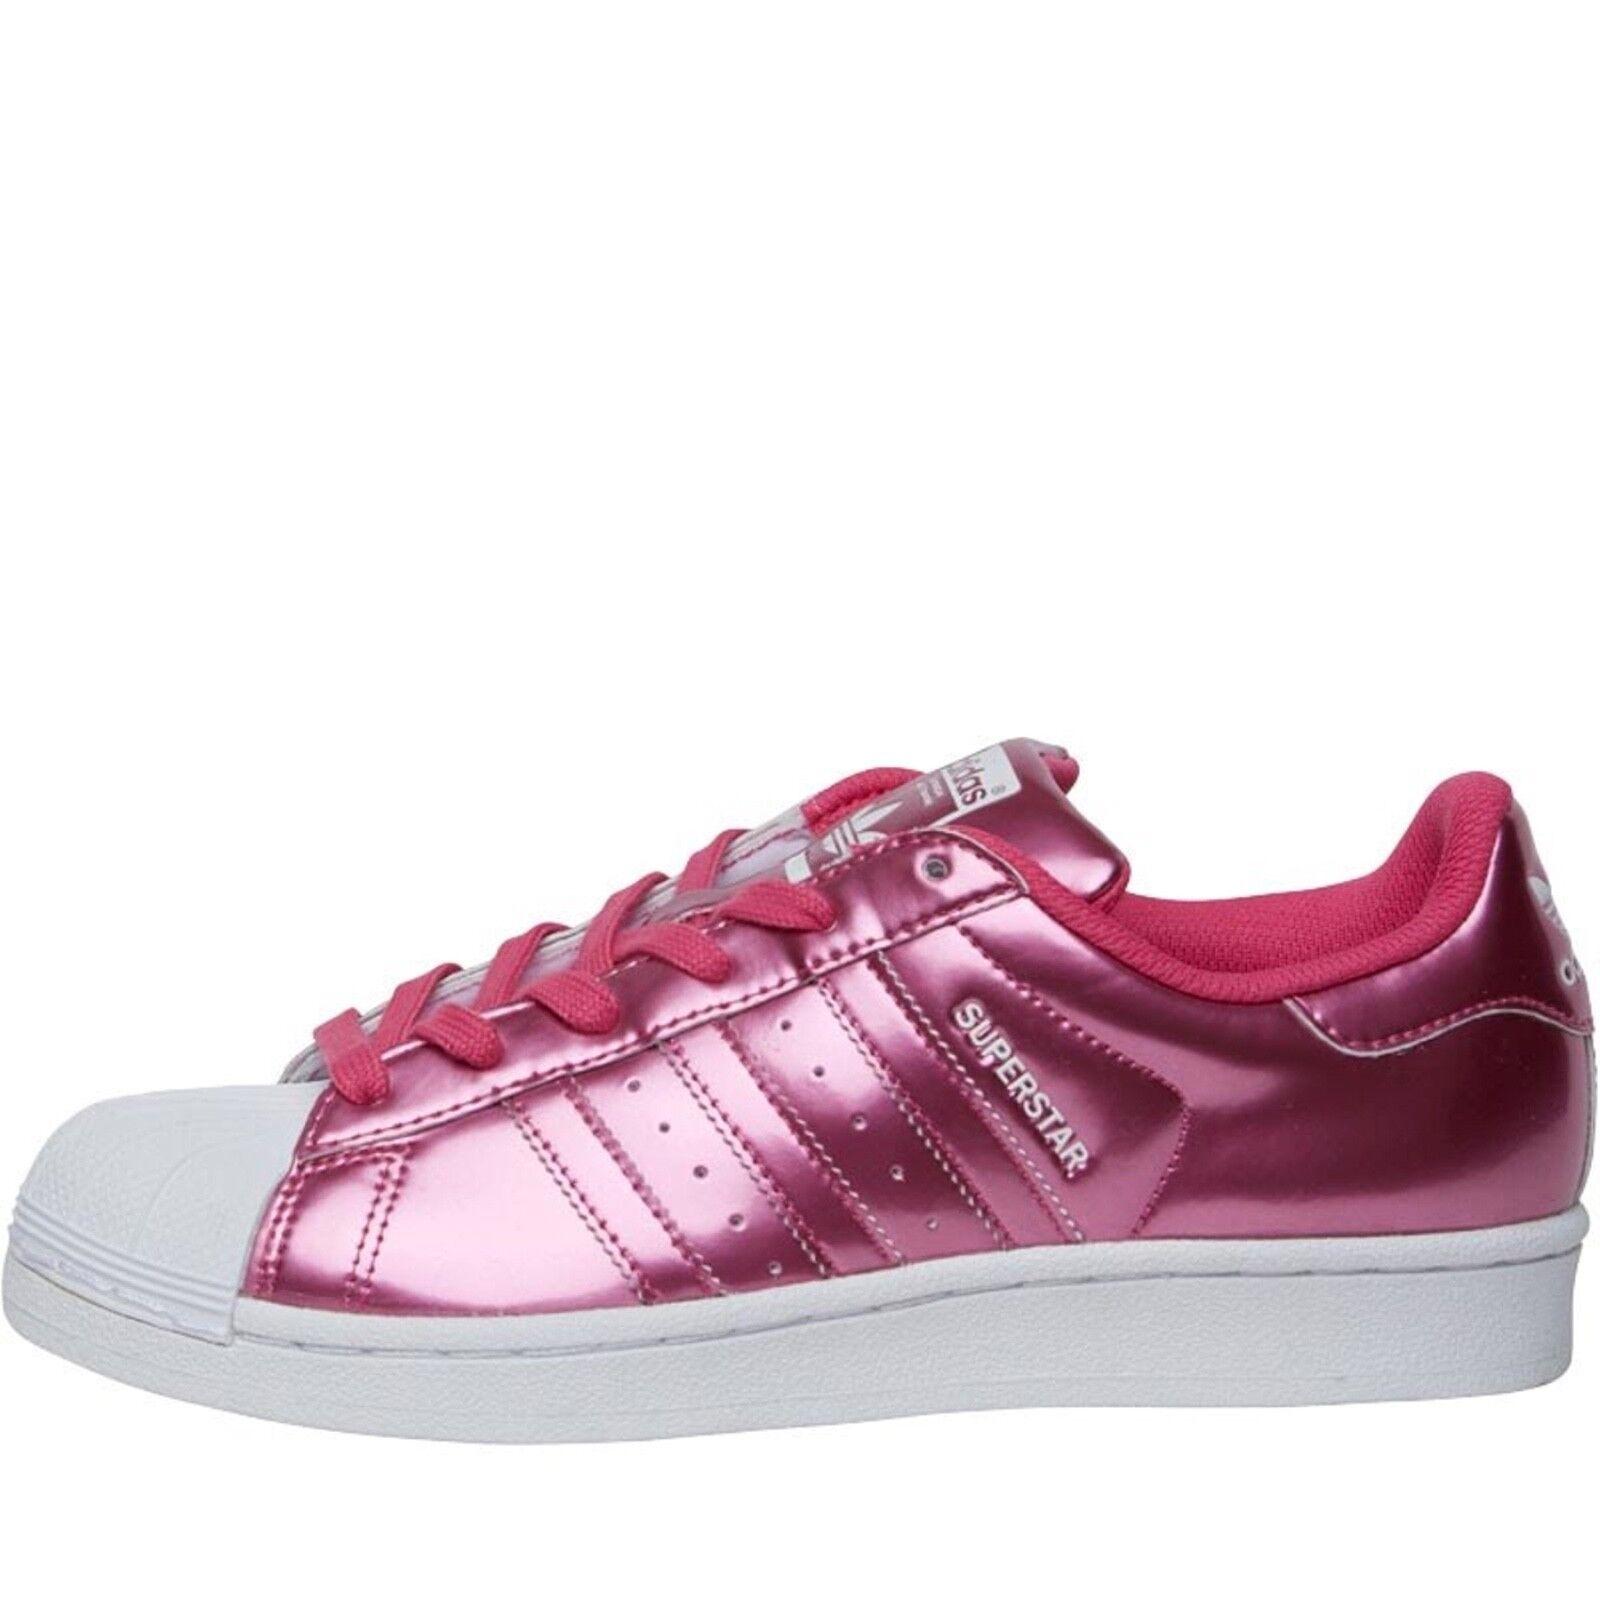 Ladies adidas originals superstar trainers pink white - size UK 6.5